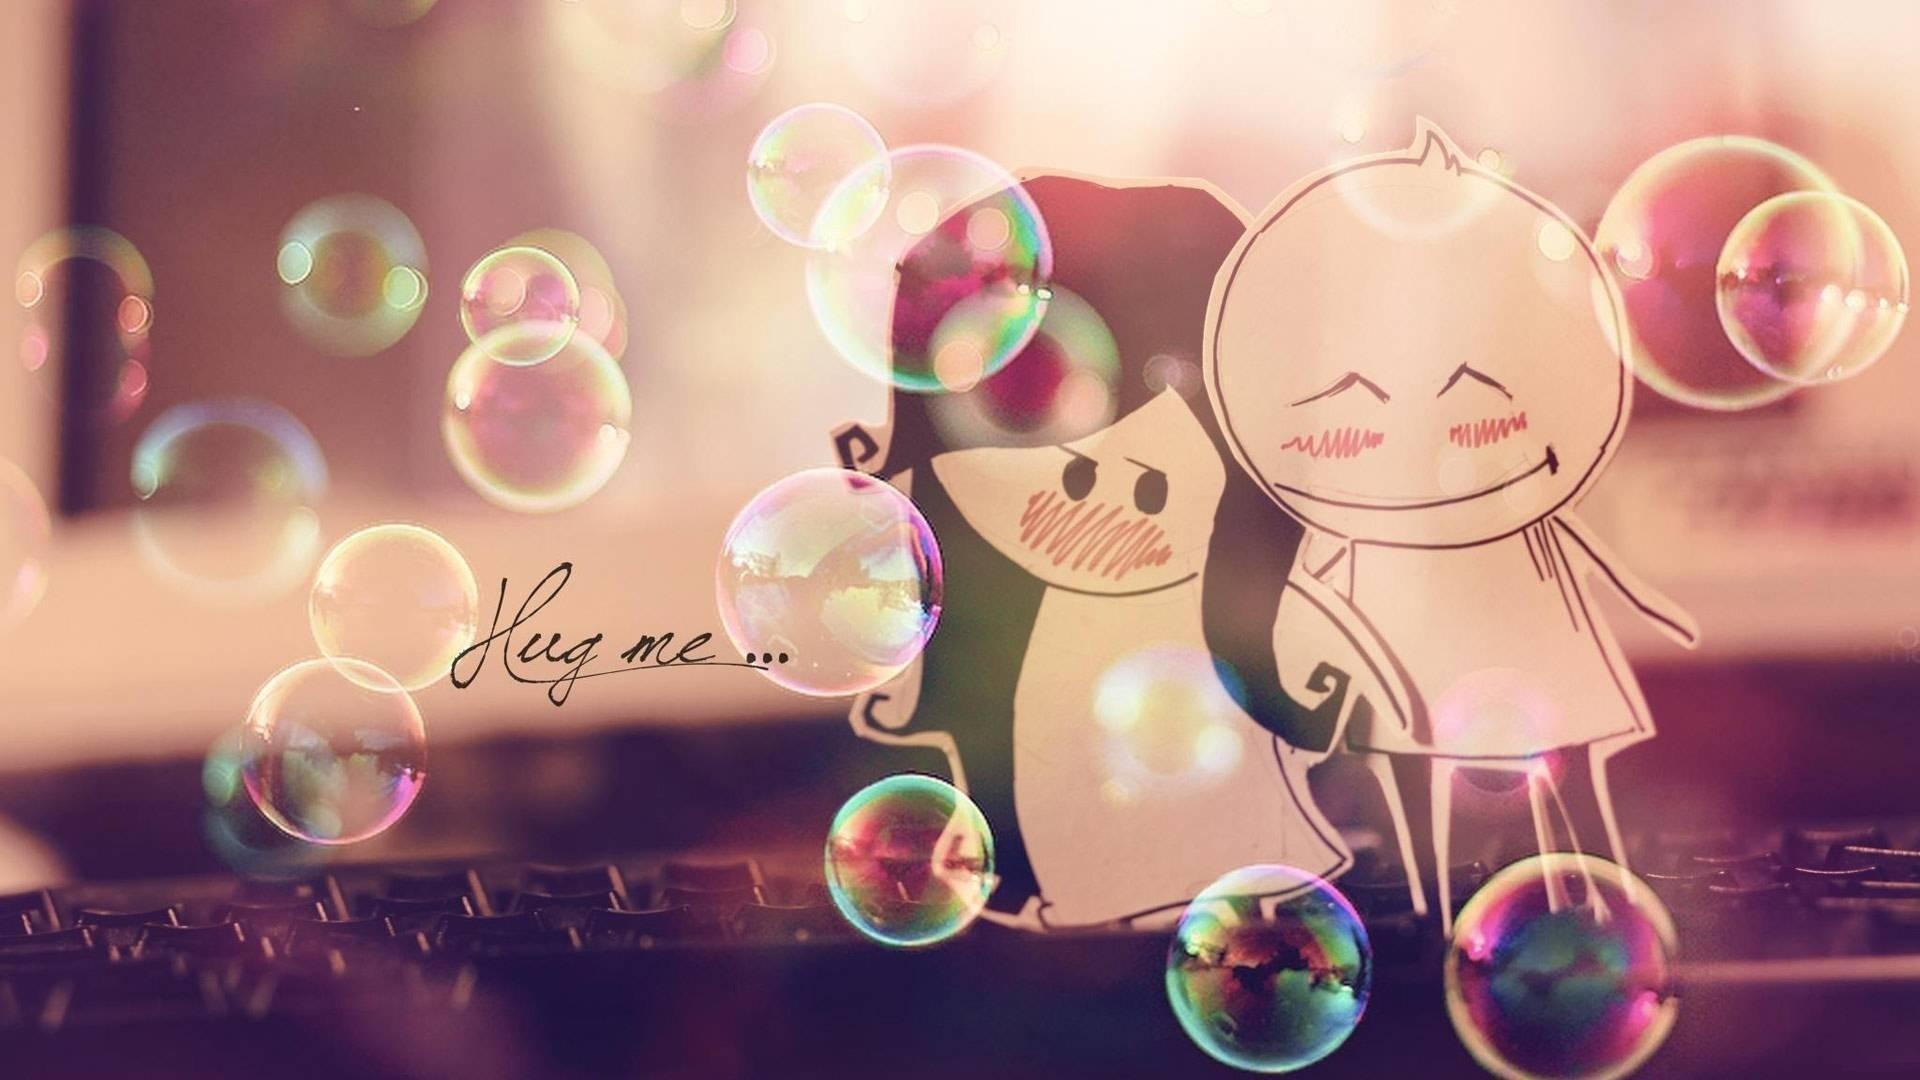 Cute Couple Love Romantic Wallpaper – Hug me .